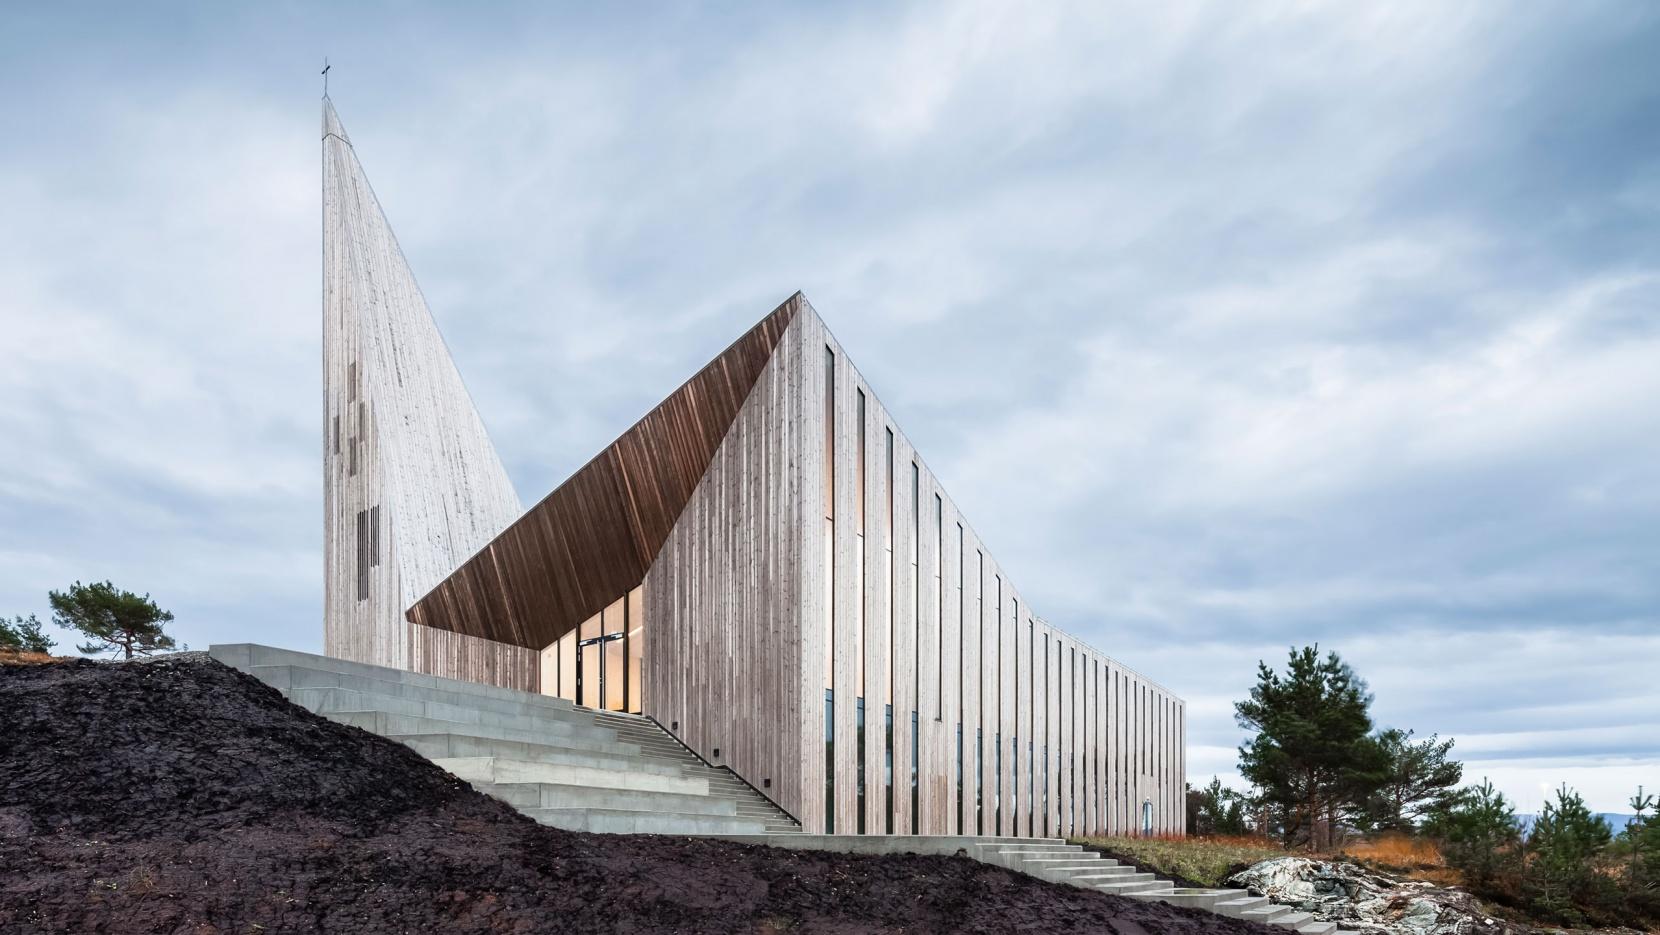 Knarvik Church A Futuristic Interpretation Of The Traditional